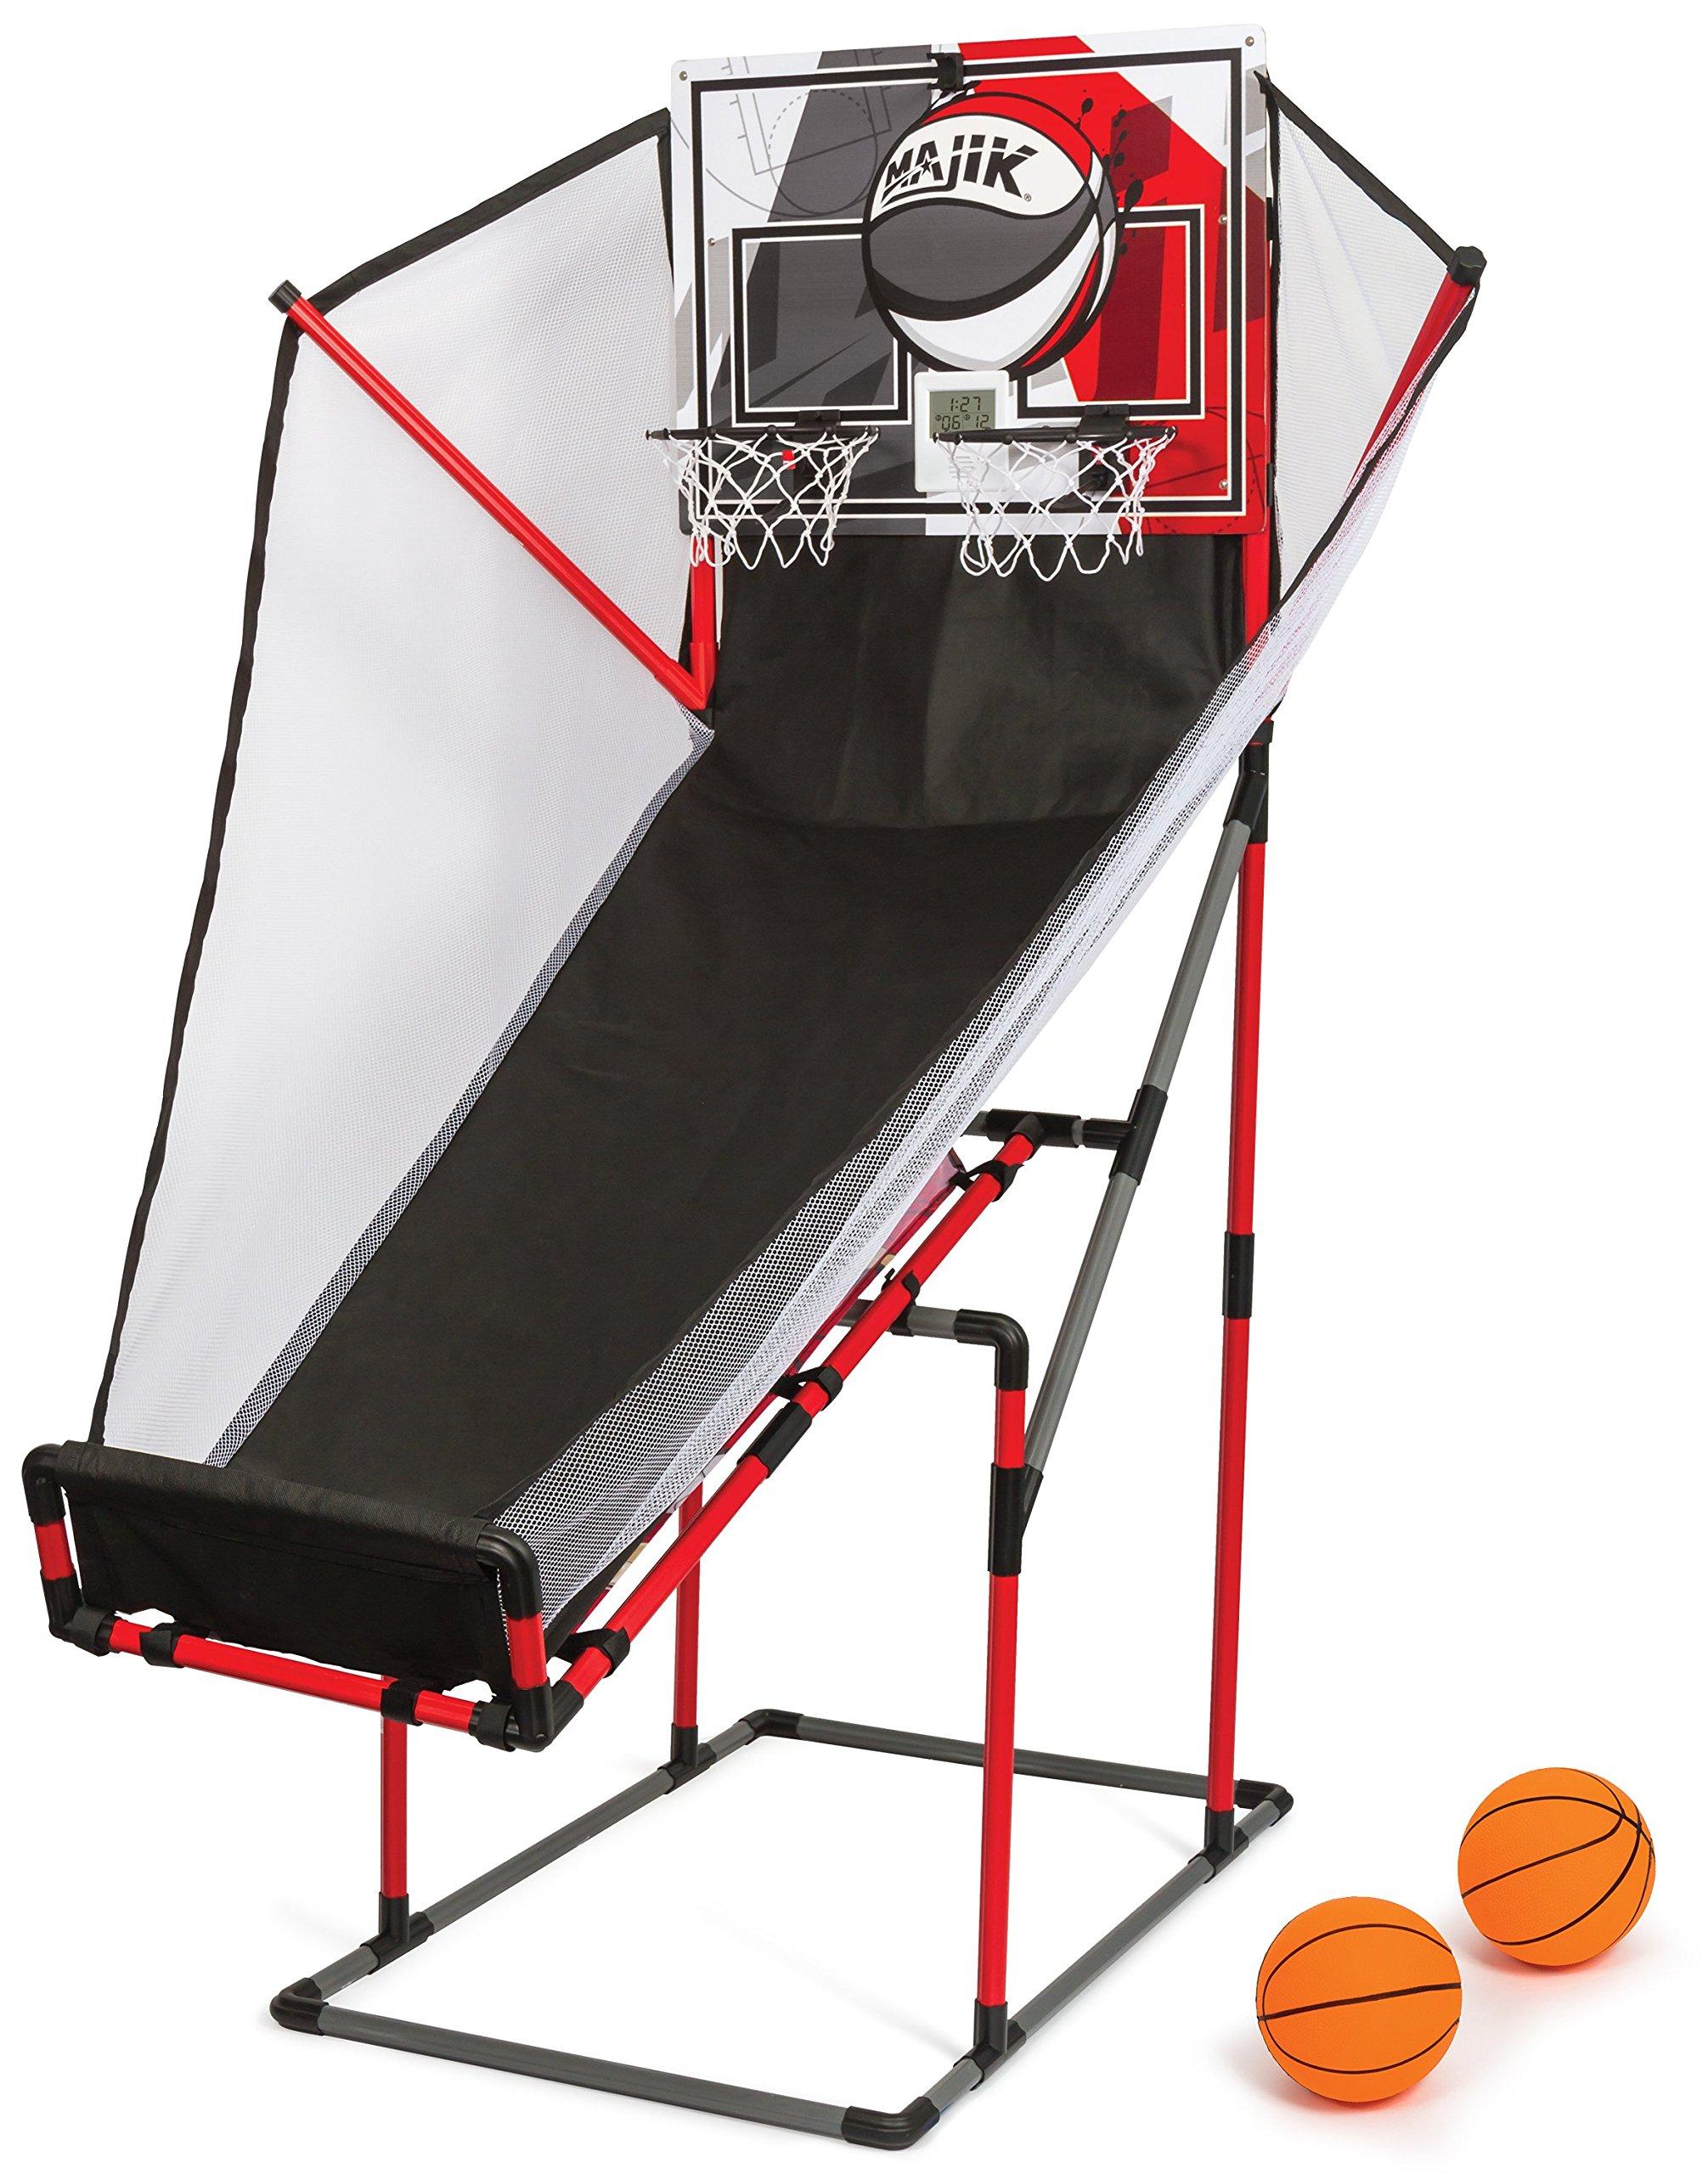 Majik Arcade 3-In-1 Sport Center for Basketball, Baseball, and Football by Majik